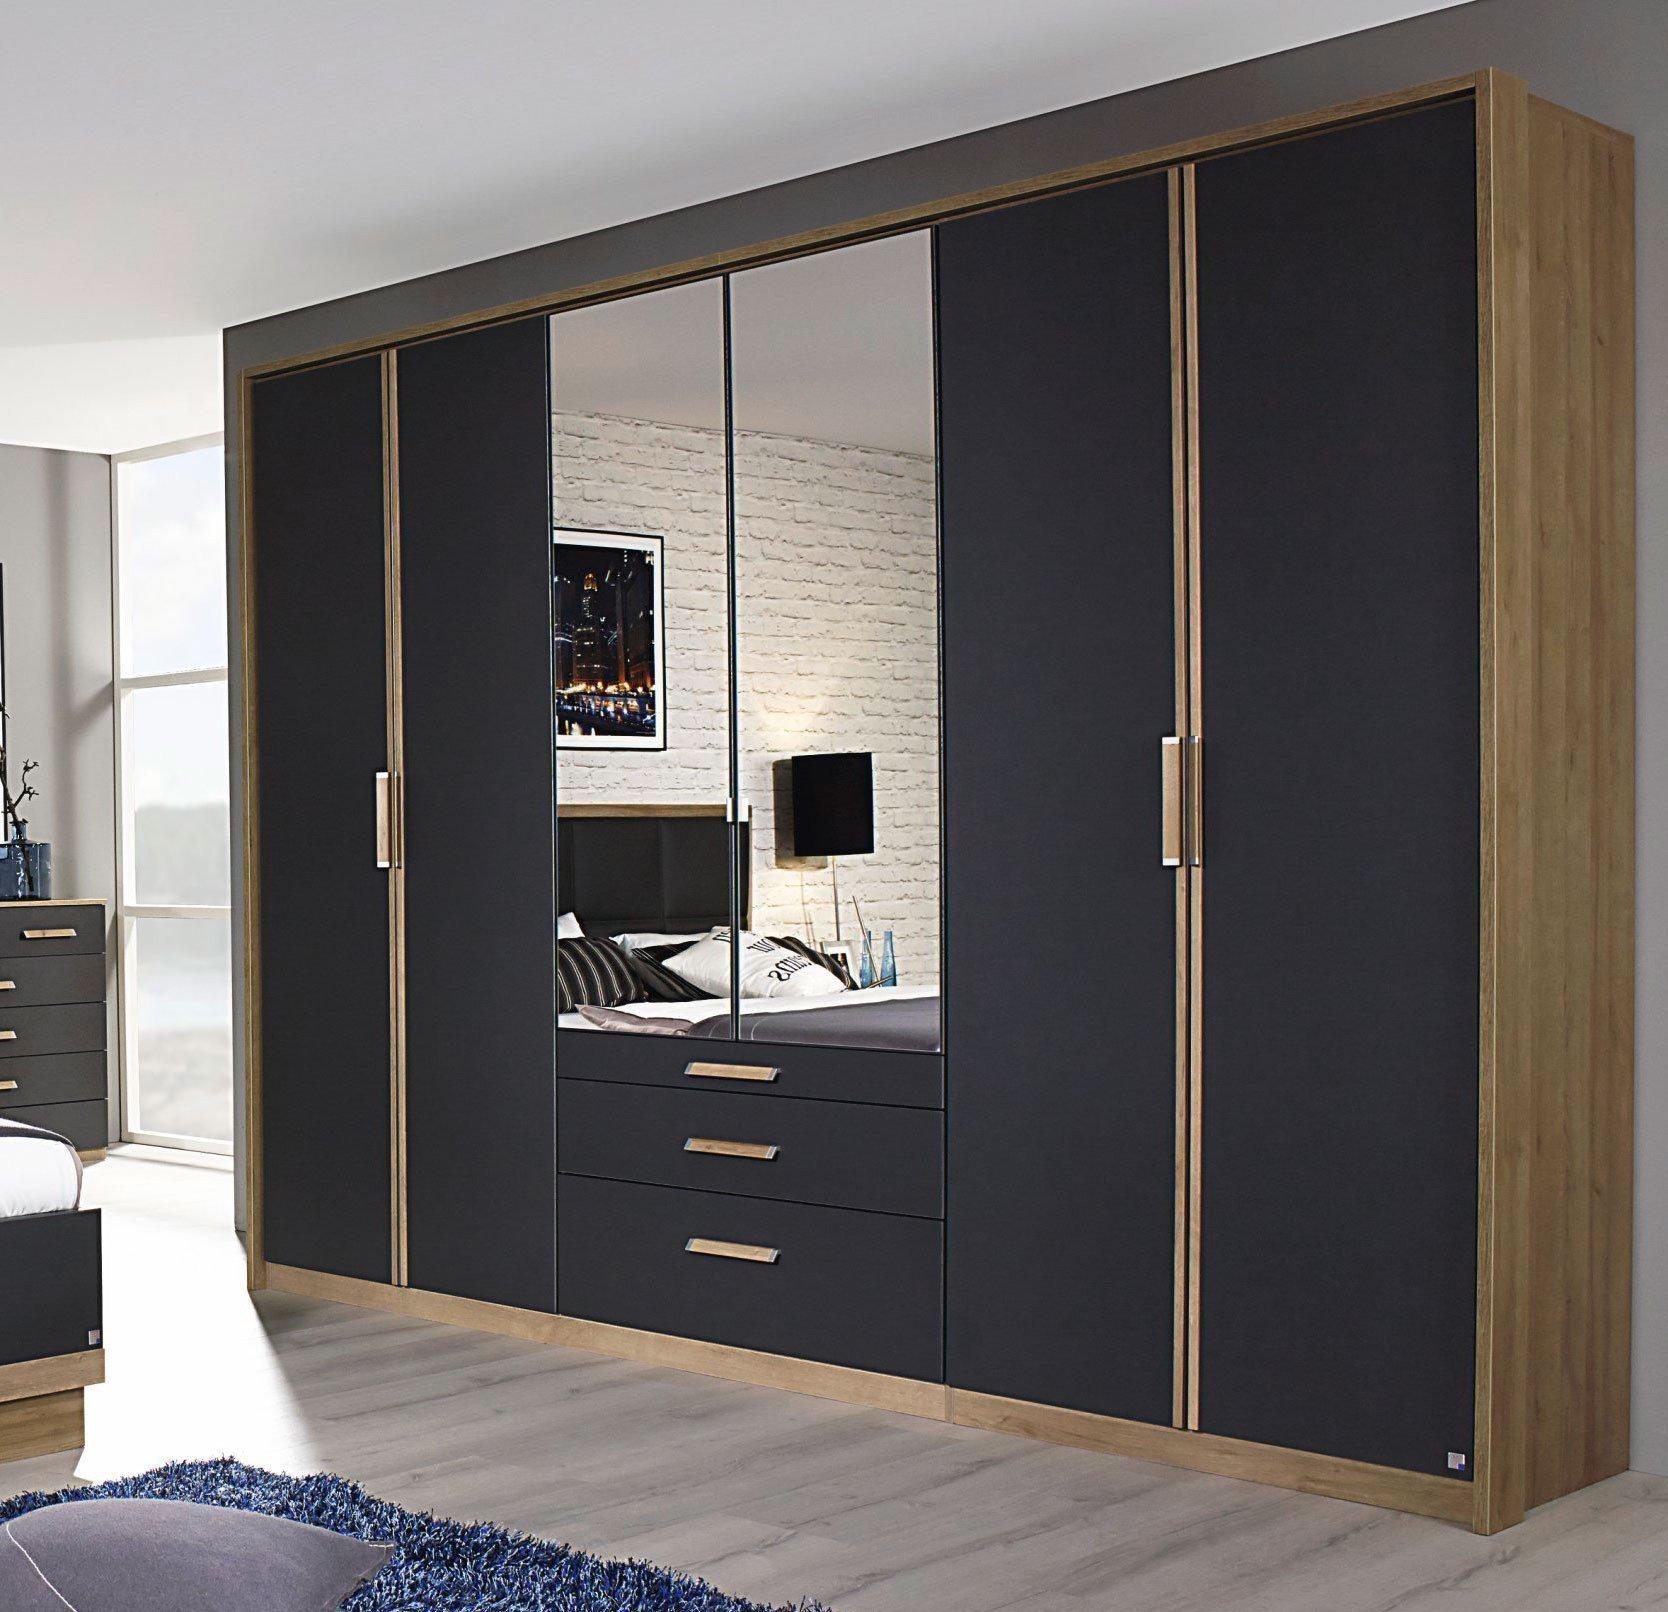 rauch pack 39 s altona schlafzimmer set m bel letz ihr. Black Bedroom Furniture Sets. Home Design Ideas